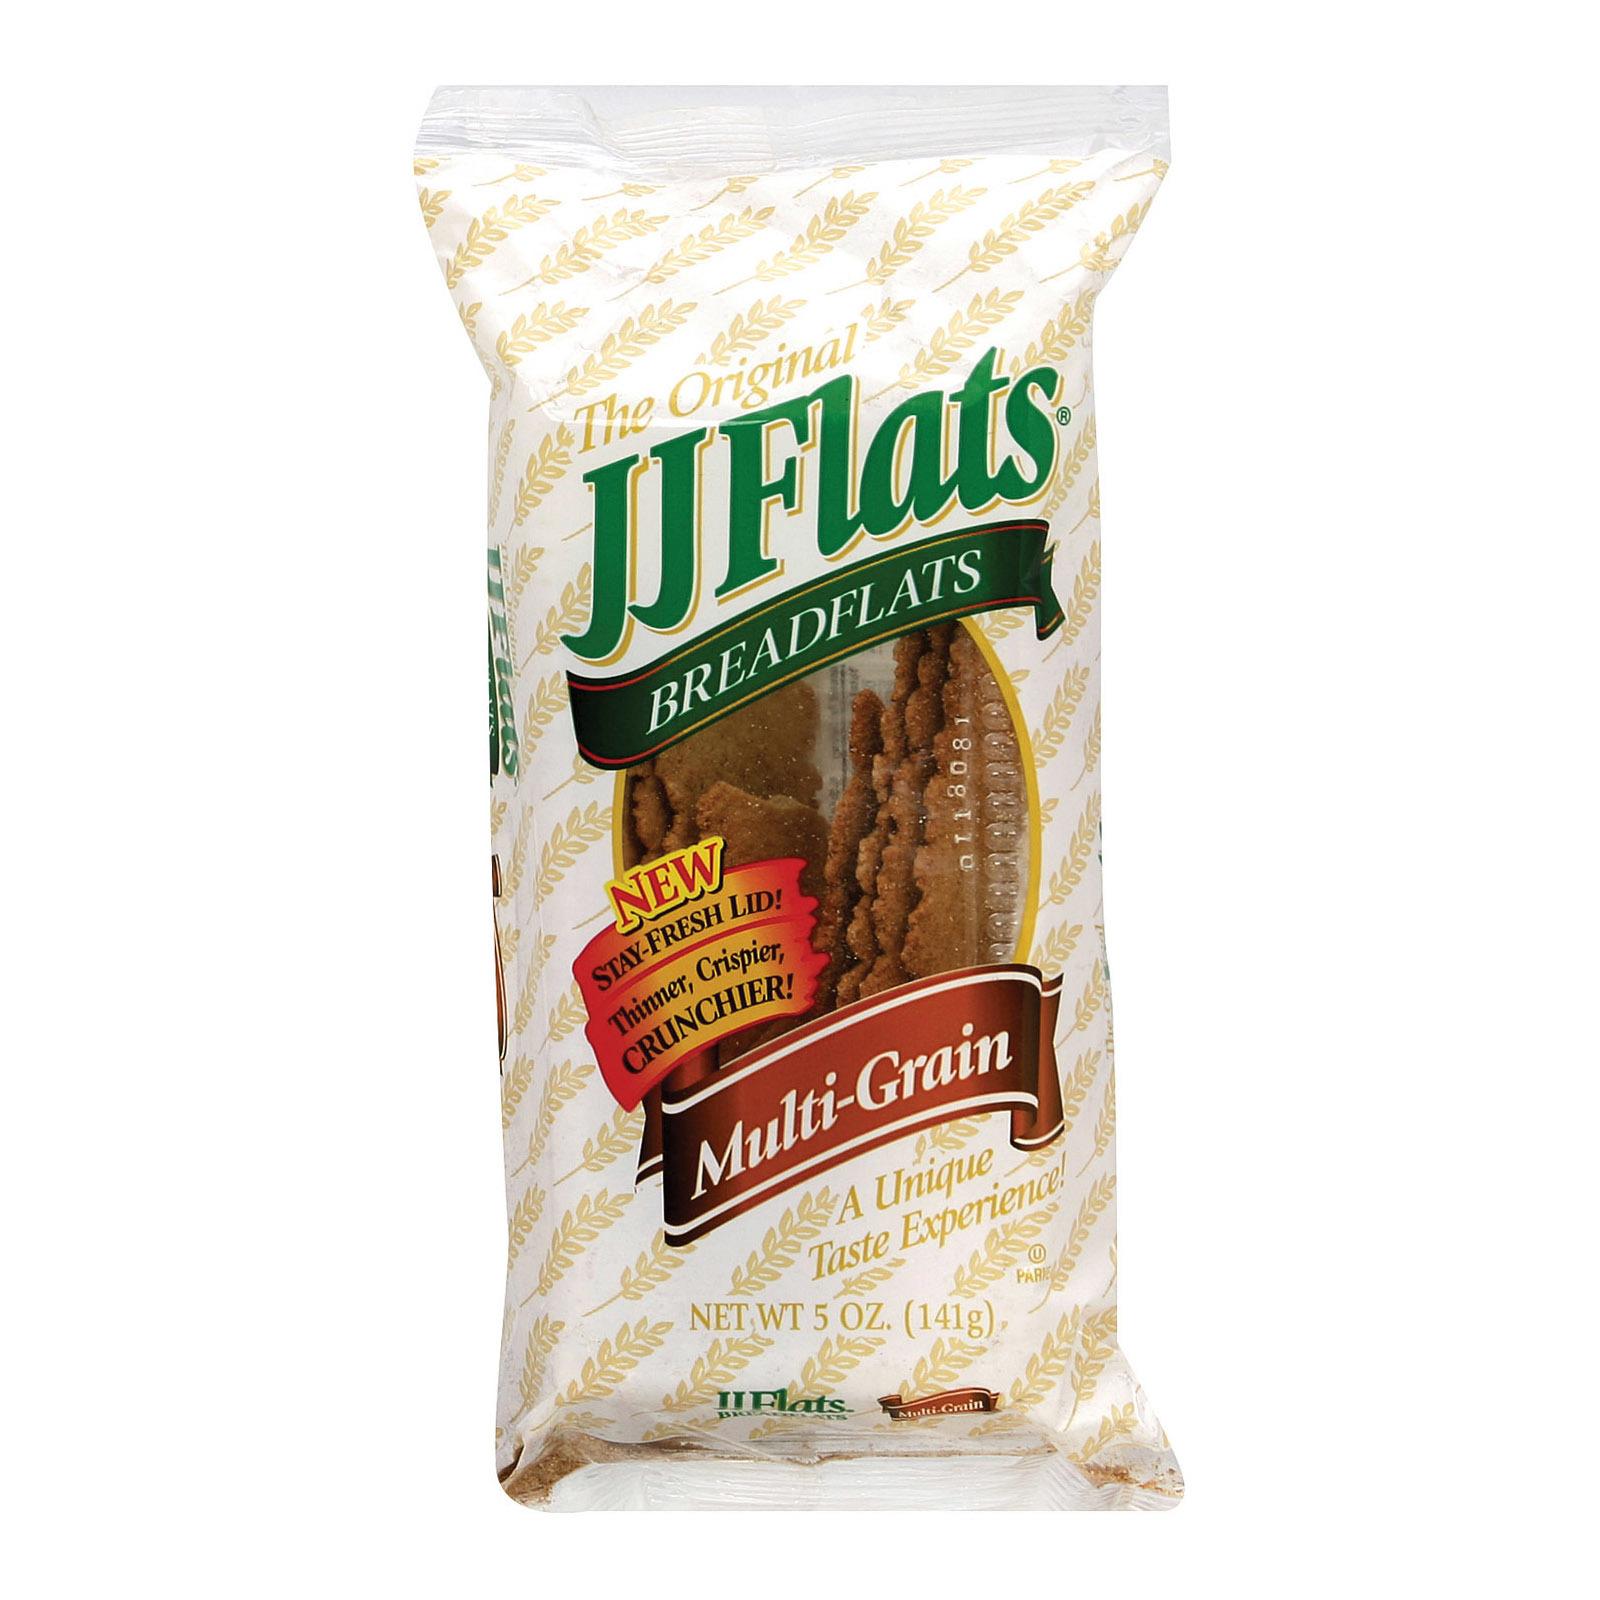 Jj Flats Flatbread - 7 Grain - Case of 12 - 5 oz.